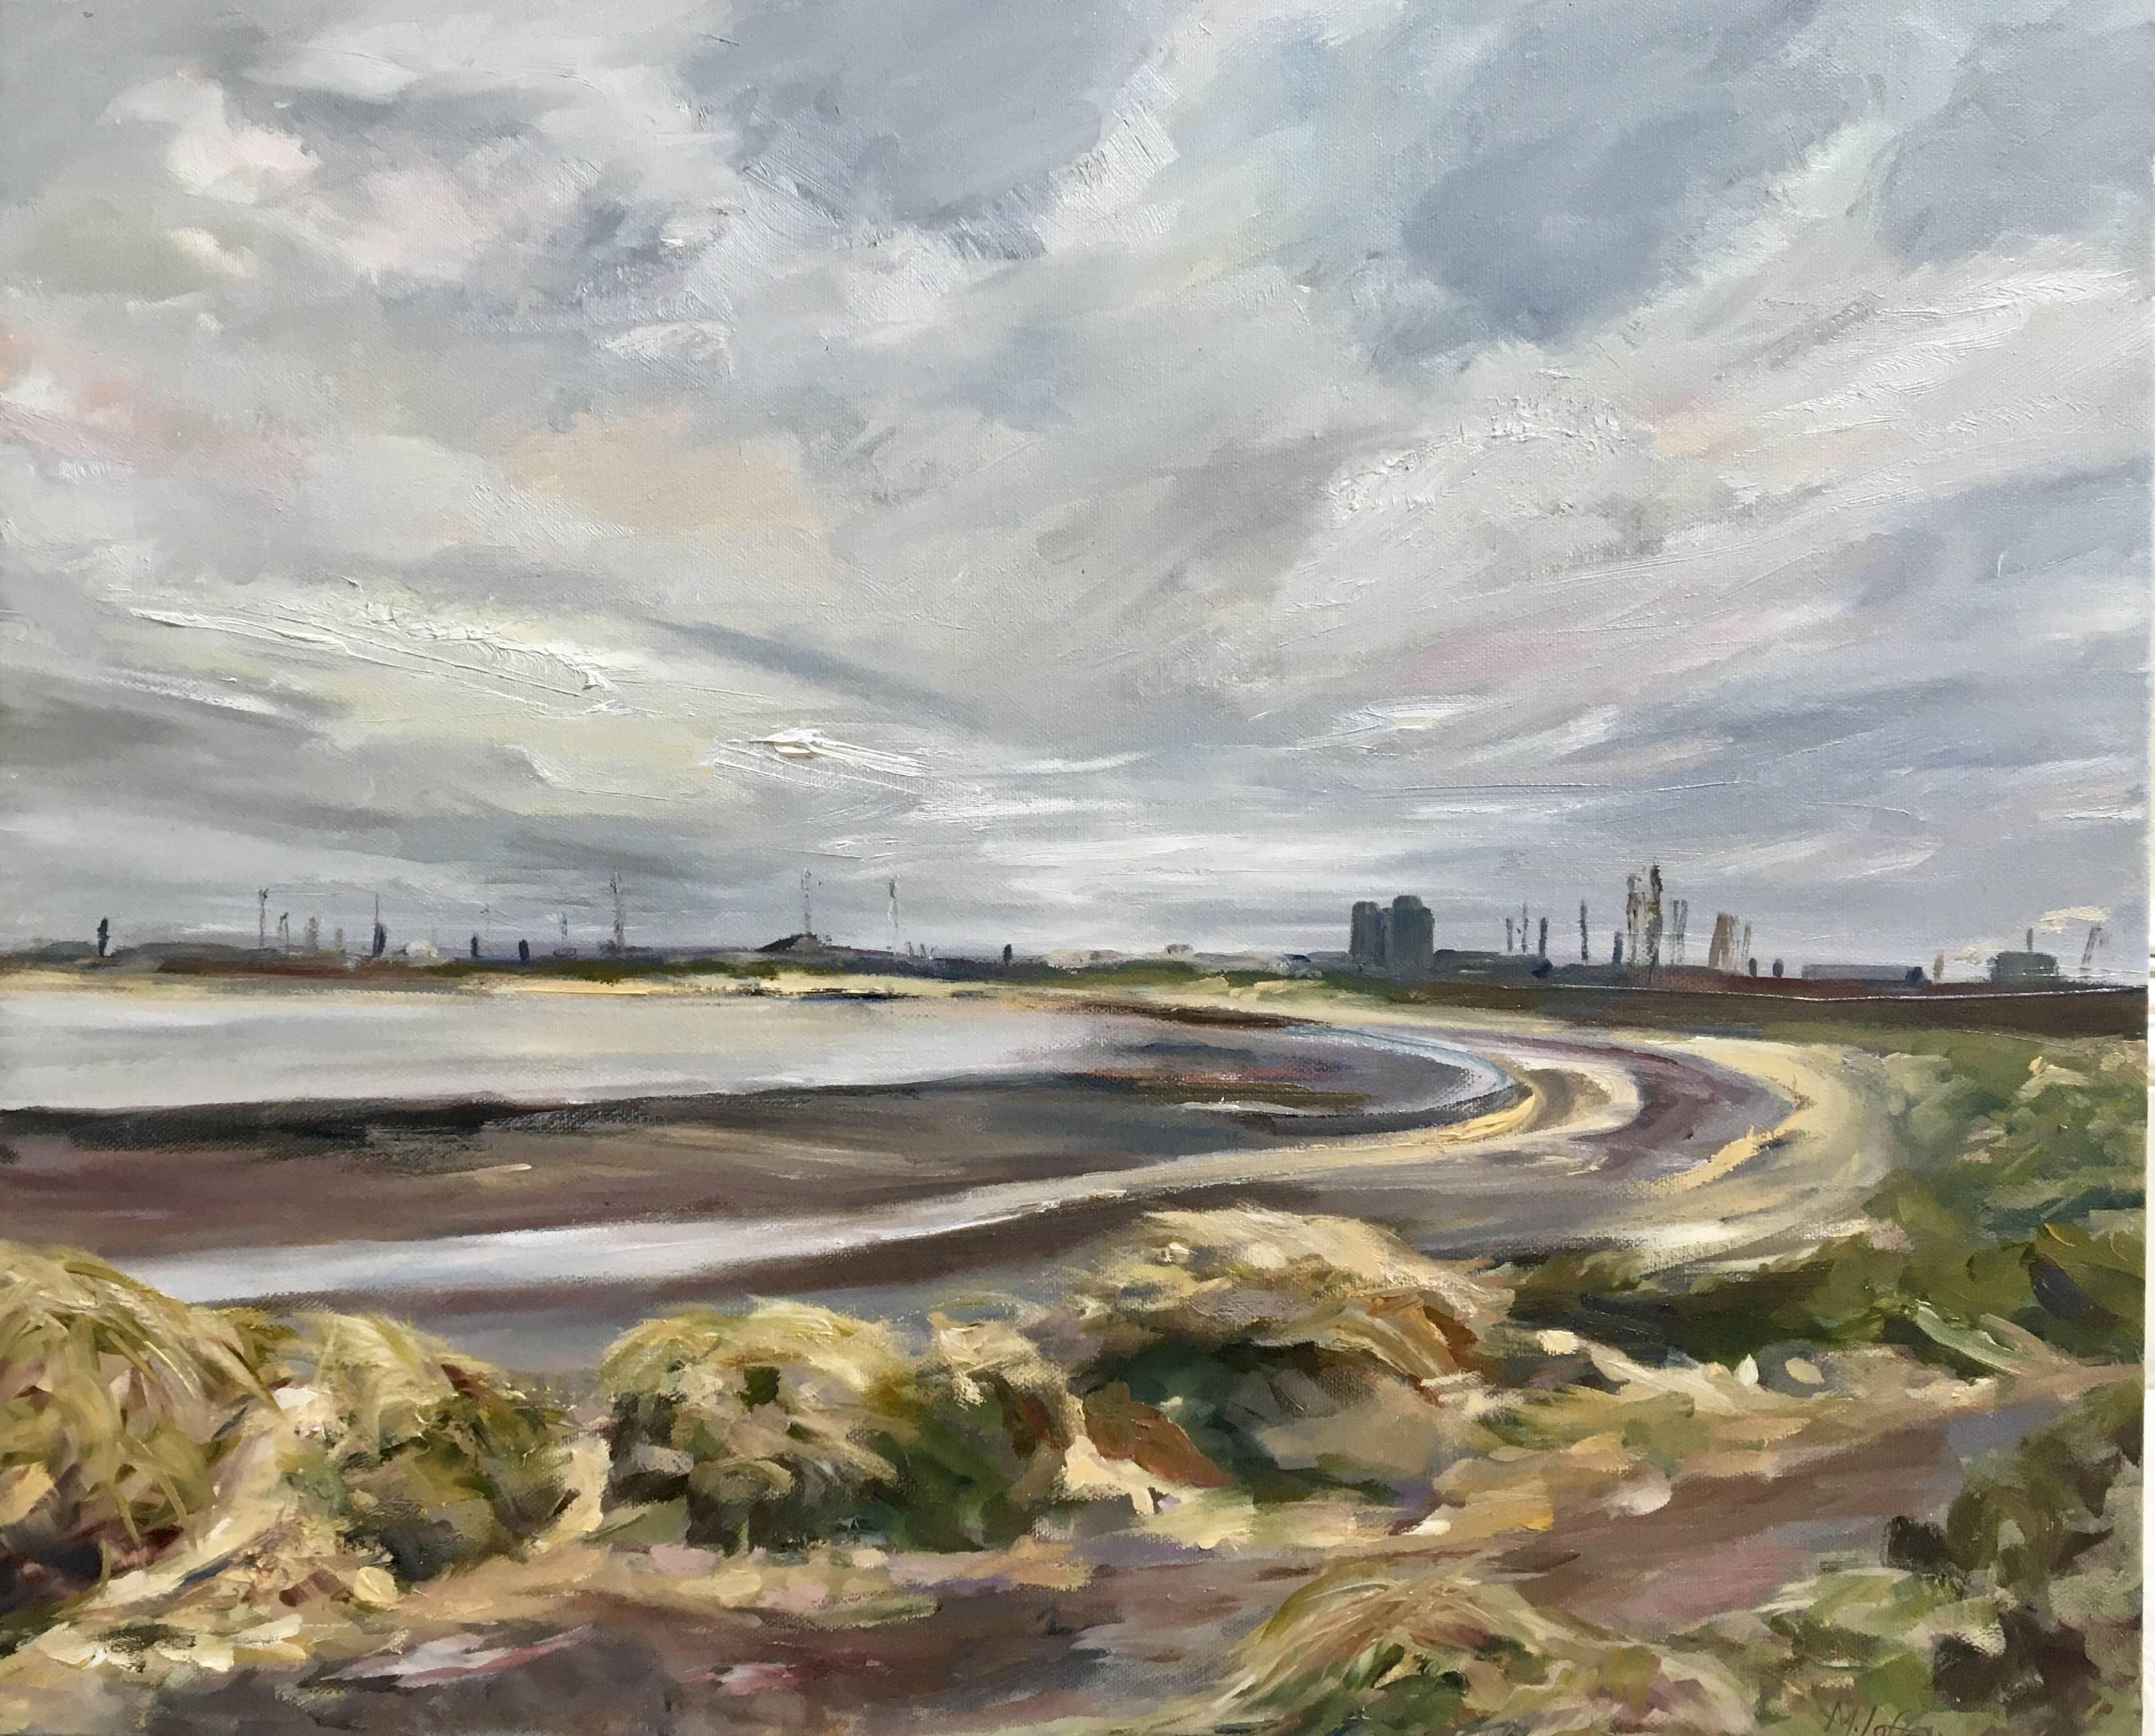 Oil Painting tees estuary sand dunes hartlepool seaton carew low tide industrial landscape